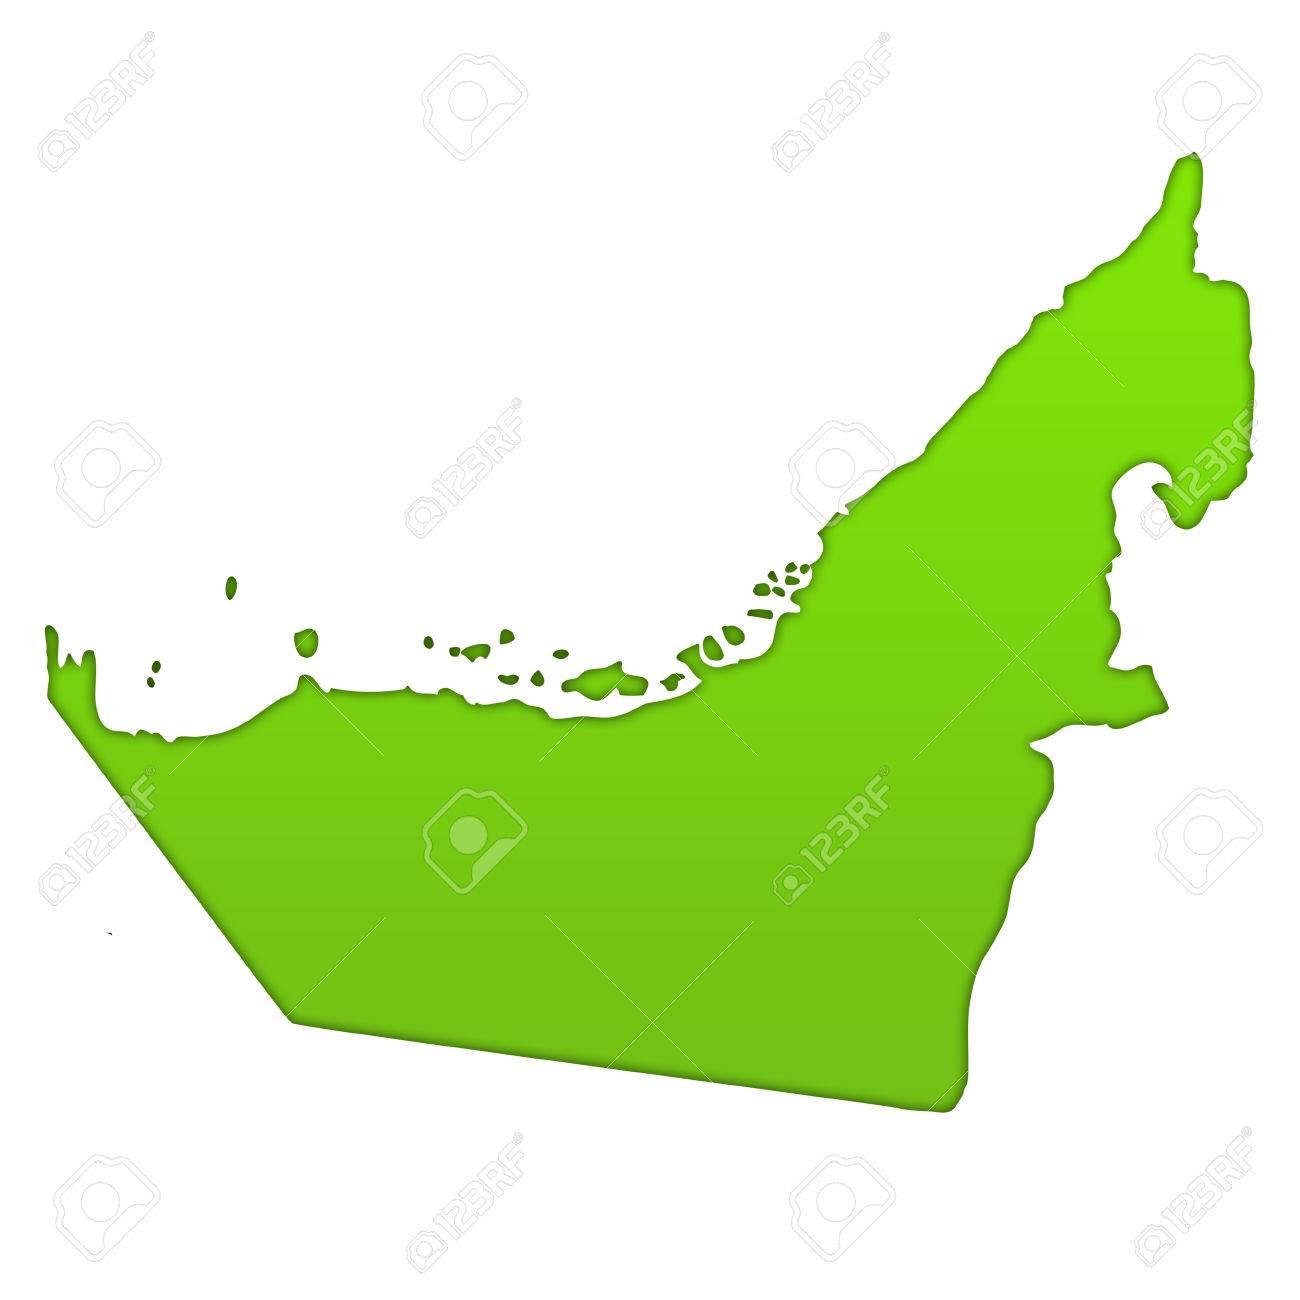 stock photo united arab emirates country icon map